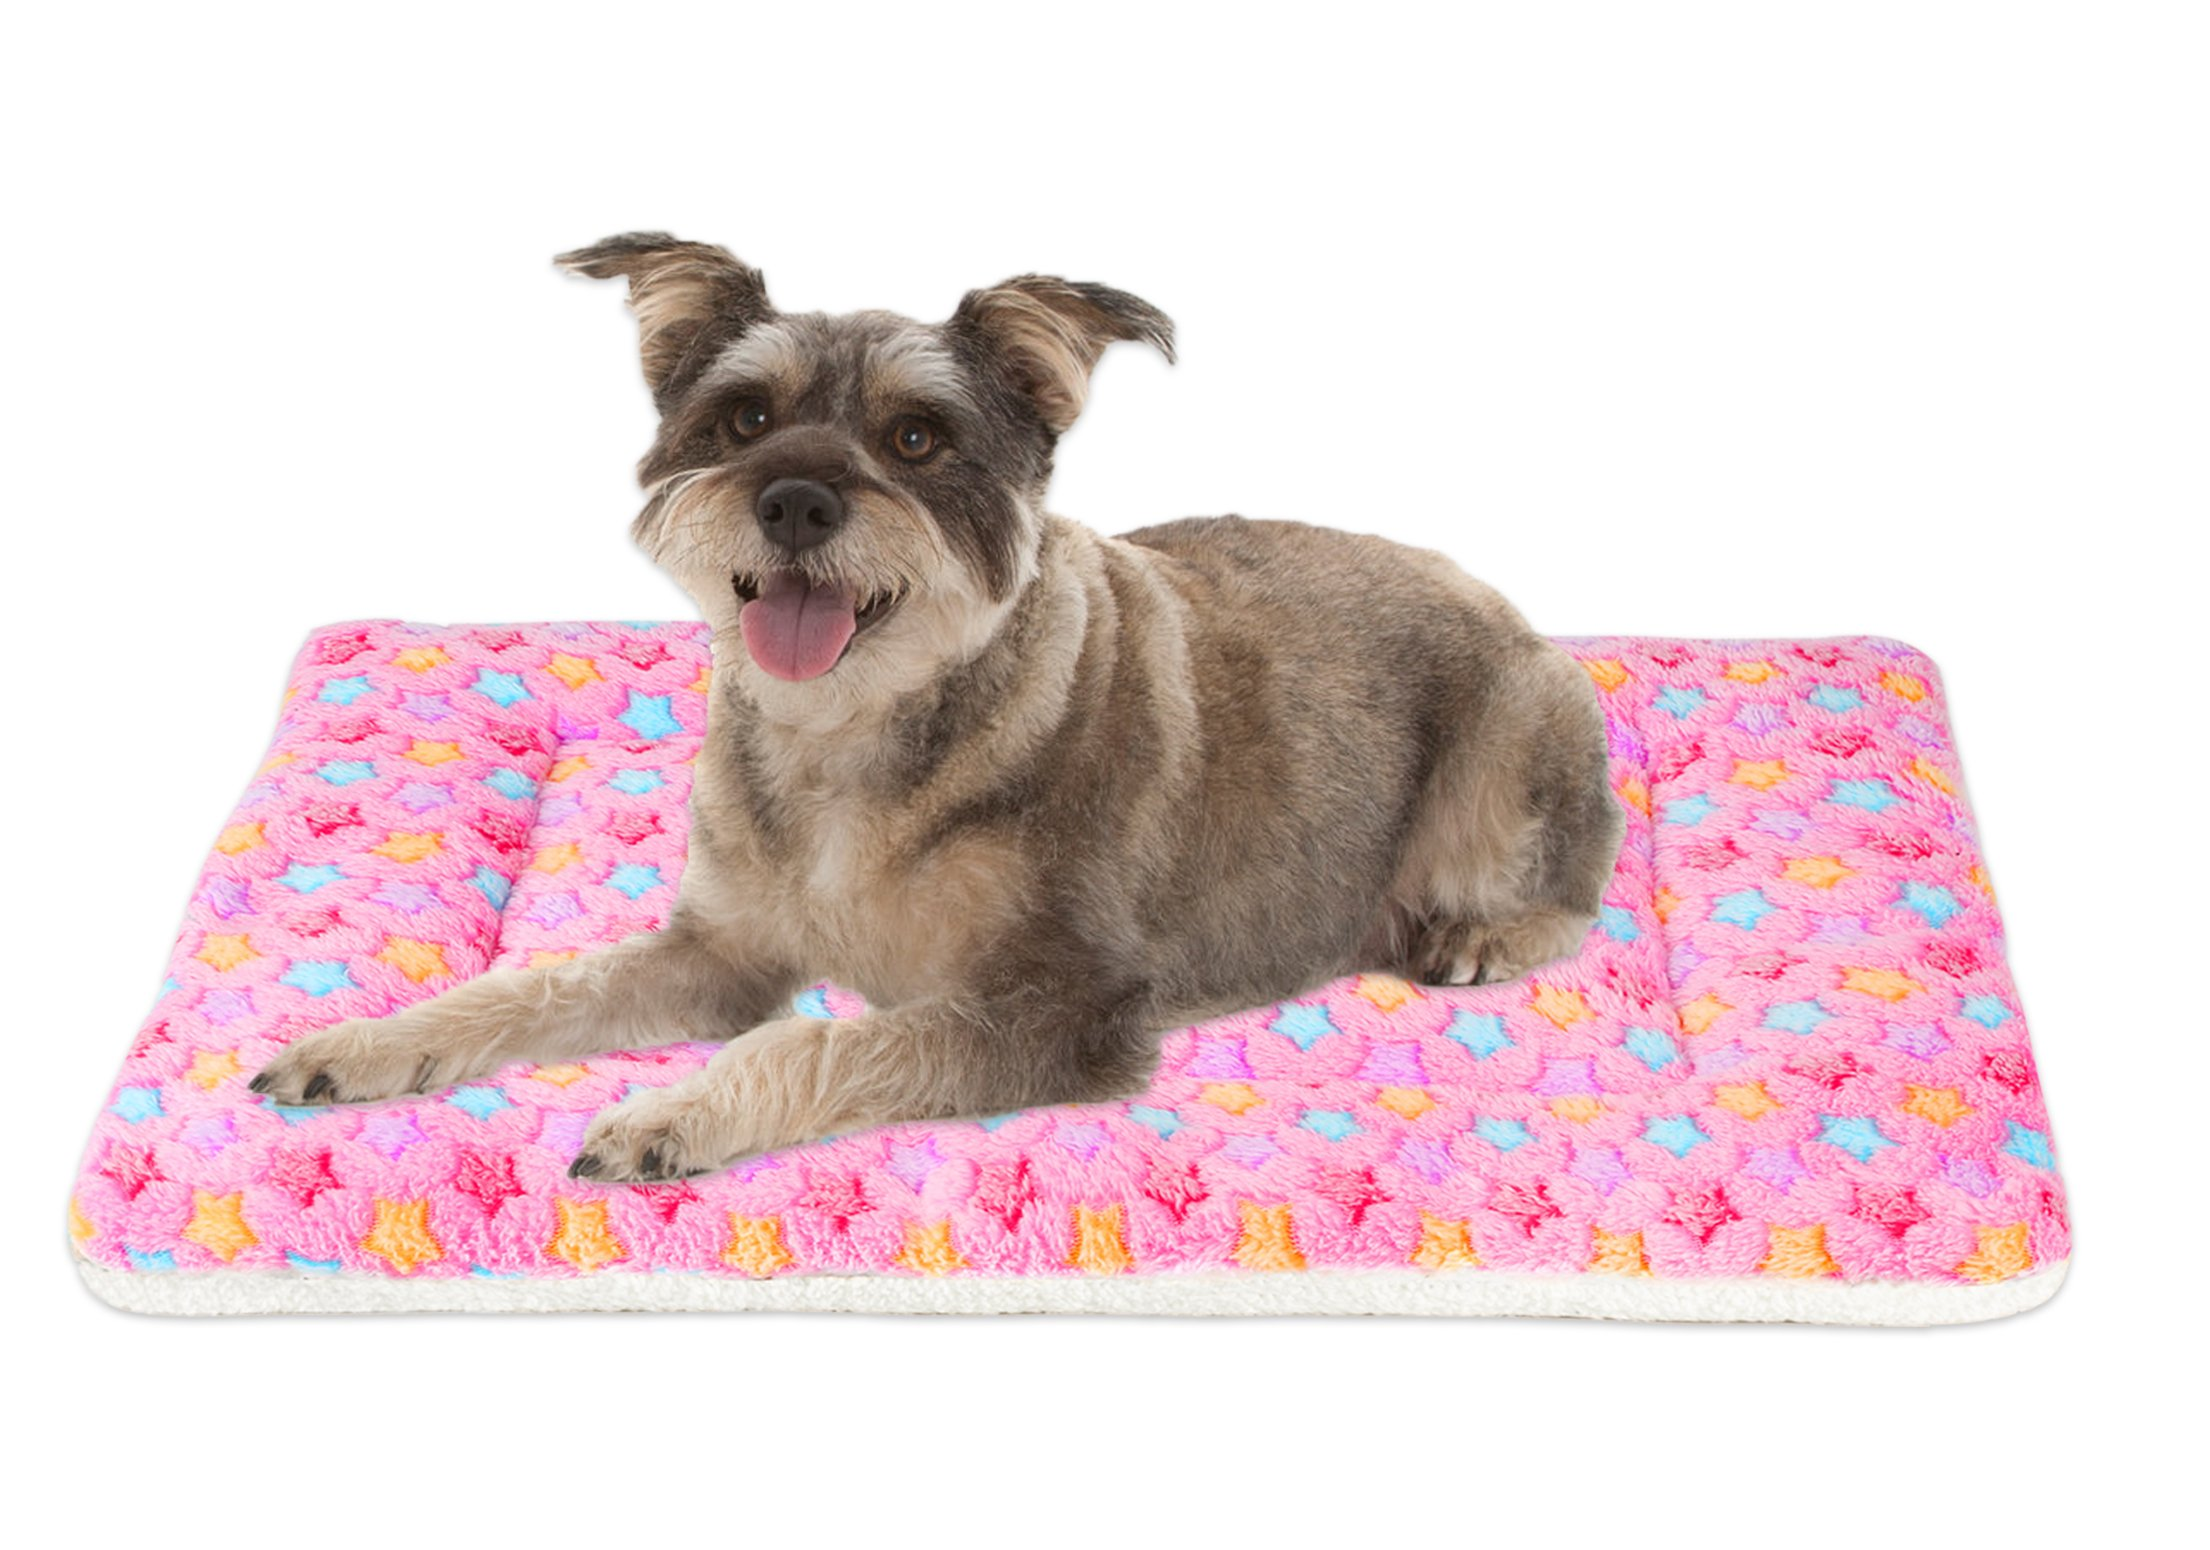 Mora Pets Ultra Soft Pet (Dog/Cat) Bed Mat Cute Prints | Reversible Fleece Dog Crate Kennel Pad | Machine Washable Pet Bed Liner (24-inch, Pink)